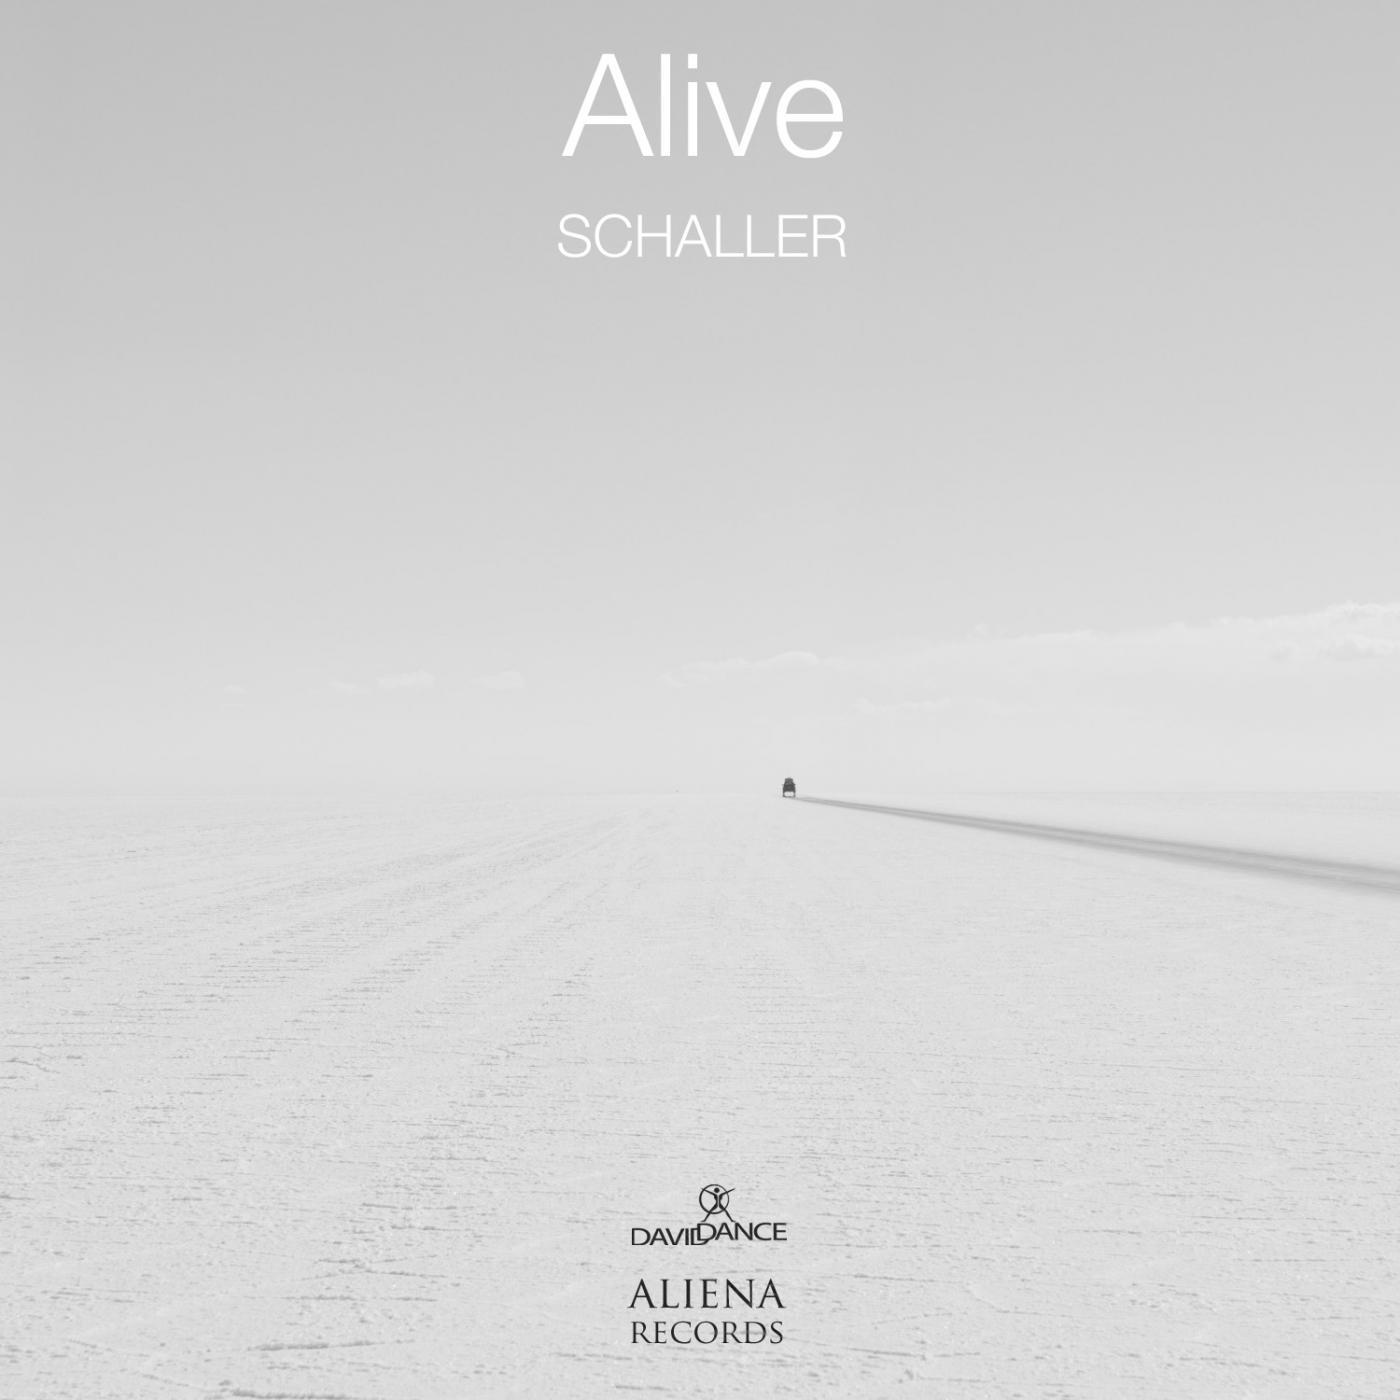 Schaller - Alive (Original mix)